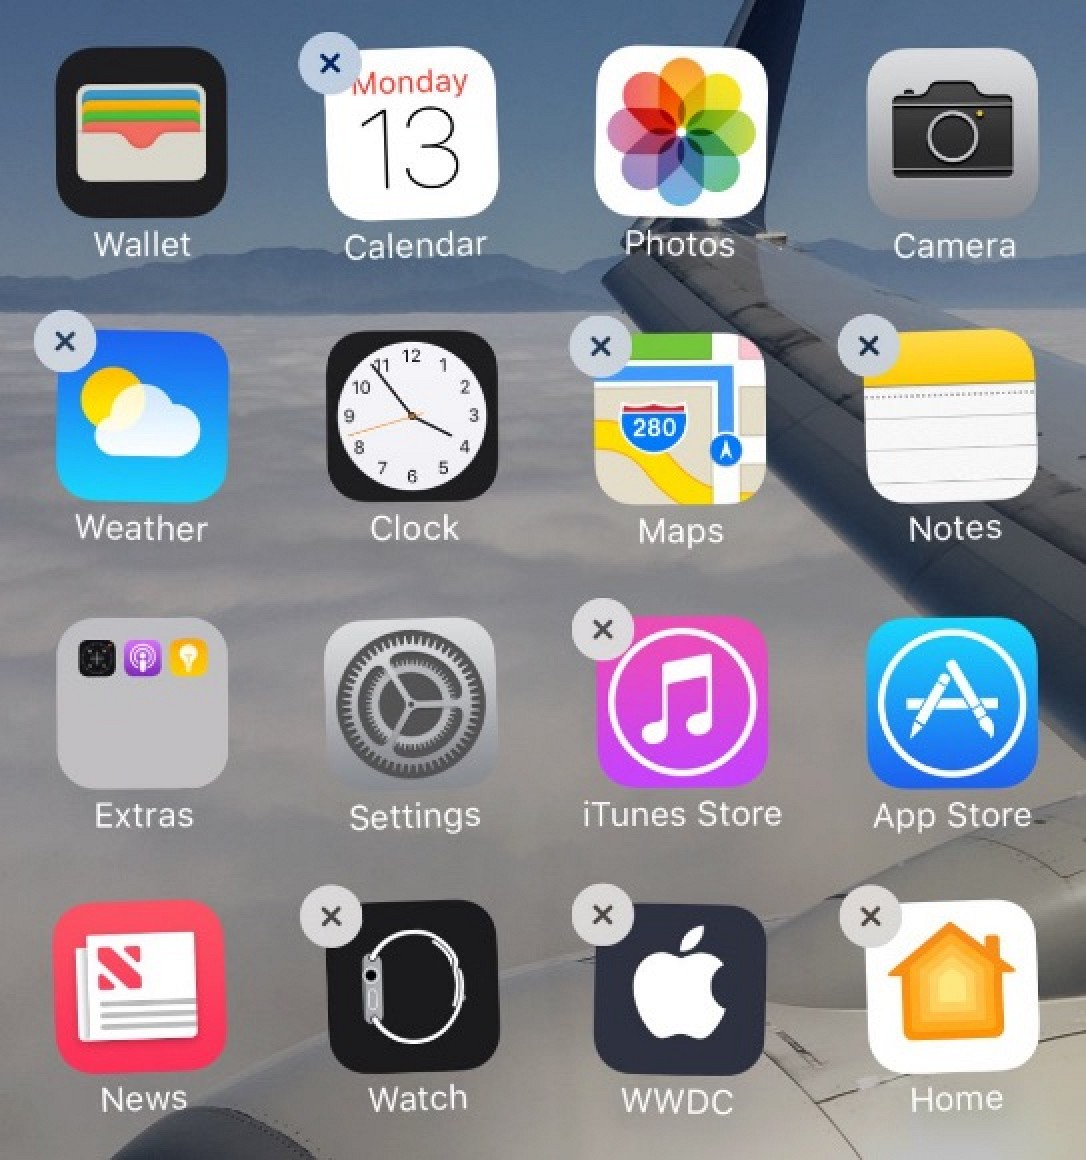 Ios 10 tidbits hide stock apps use two safari windows on ipad ios 10 tidbits hide stock apps use two safari windows on ipad access voicemail transcription and more mac rumors ccuart Gallery